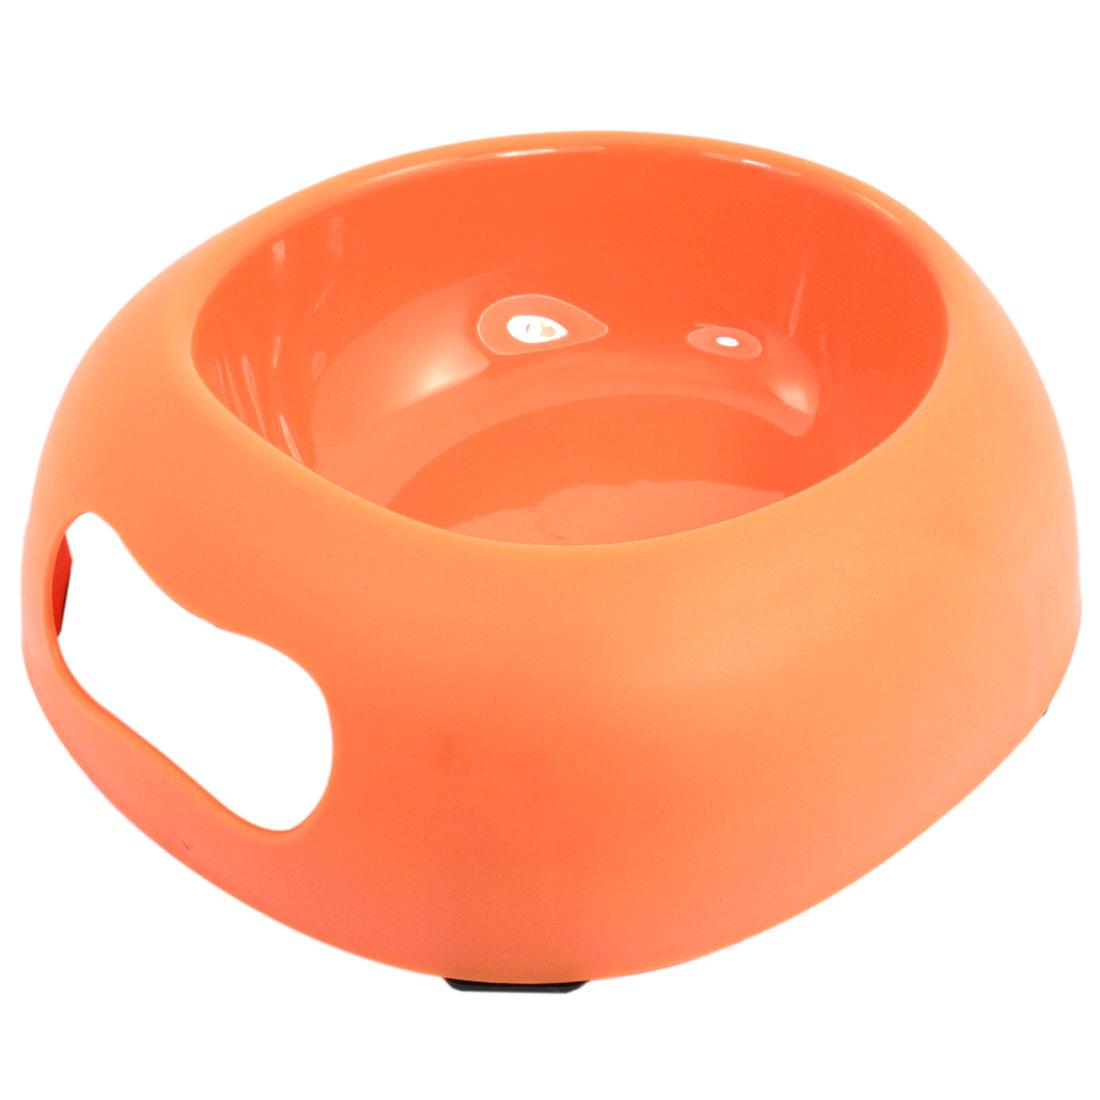 Orange Plastic Egg Shape Food Water Feeder Bowl Dish for Pet Cat Dog